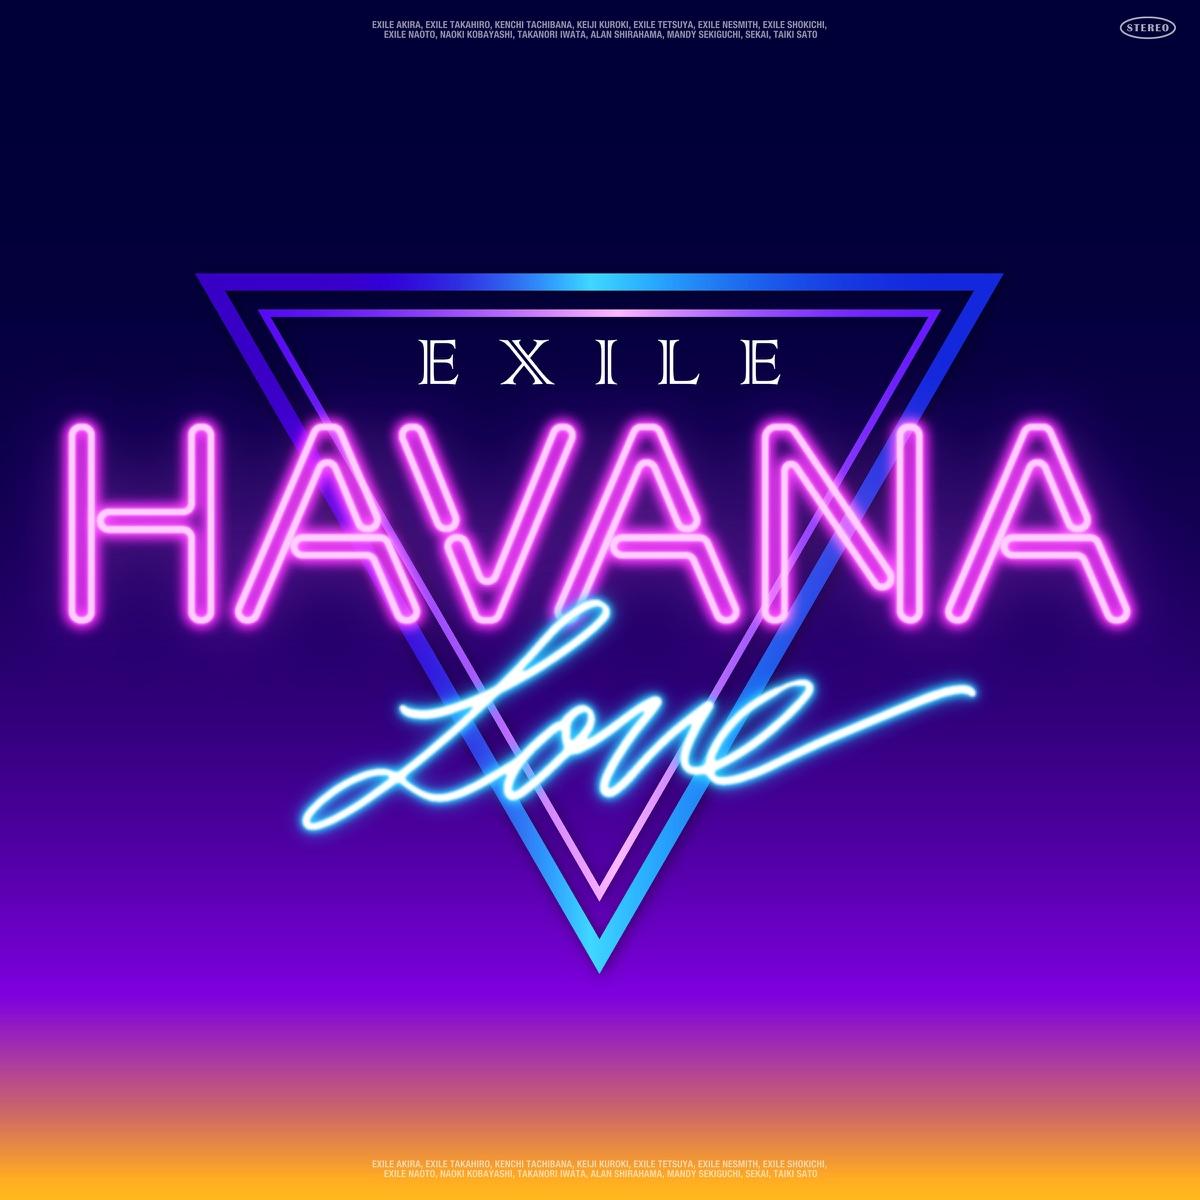 『EXILE - HAVANA LOVE』収録の『HAVANA LOVE』ジャケット